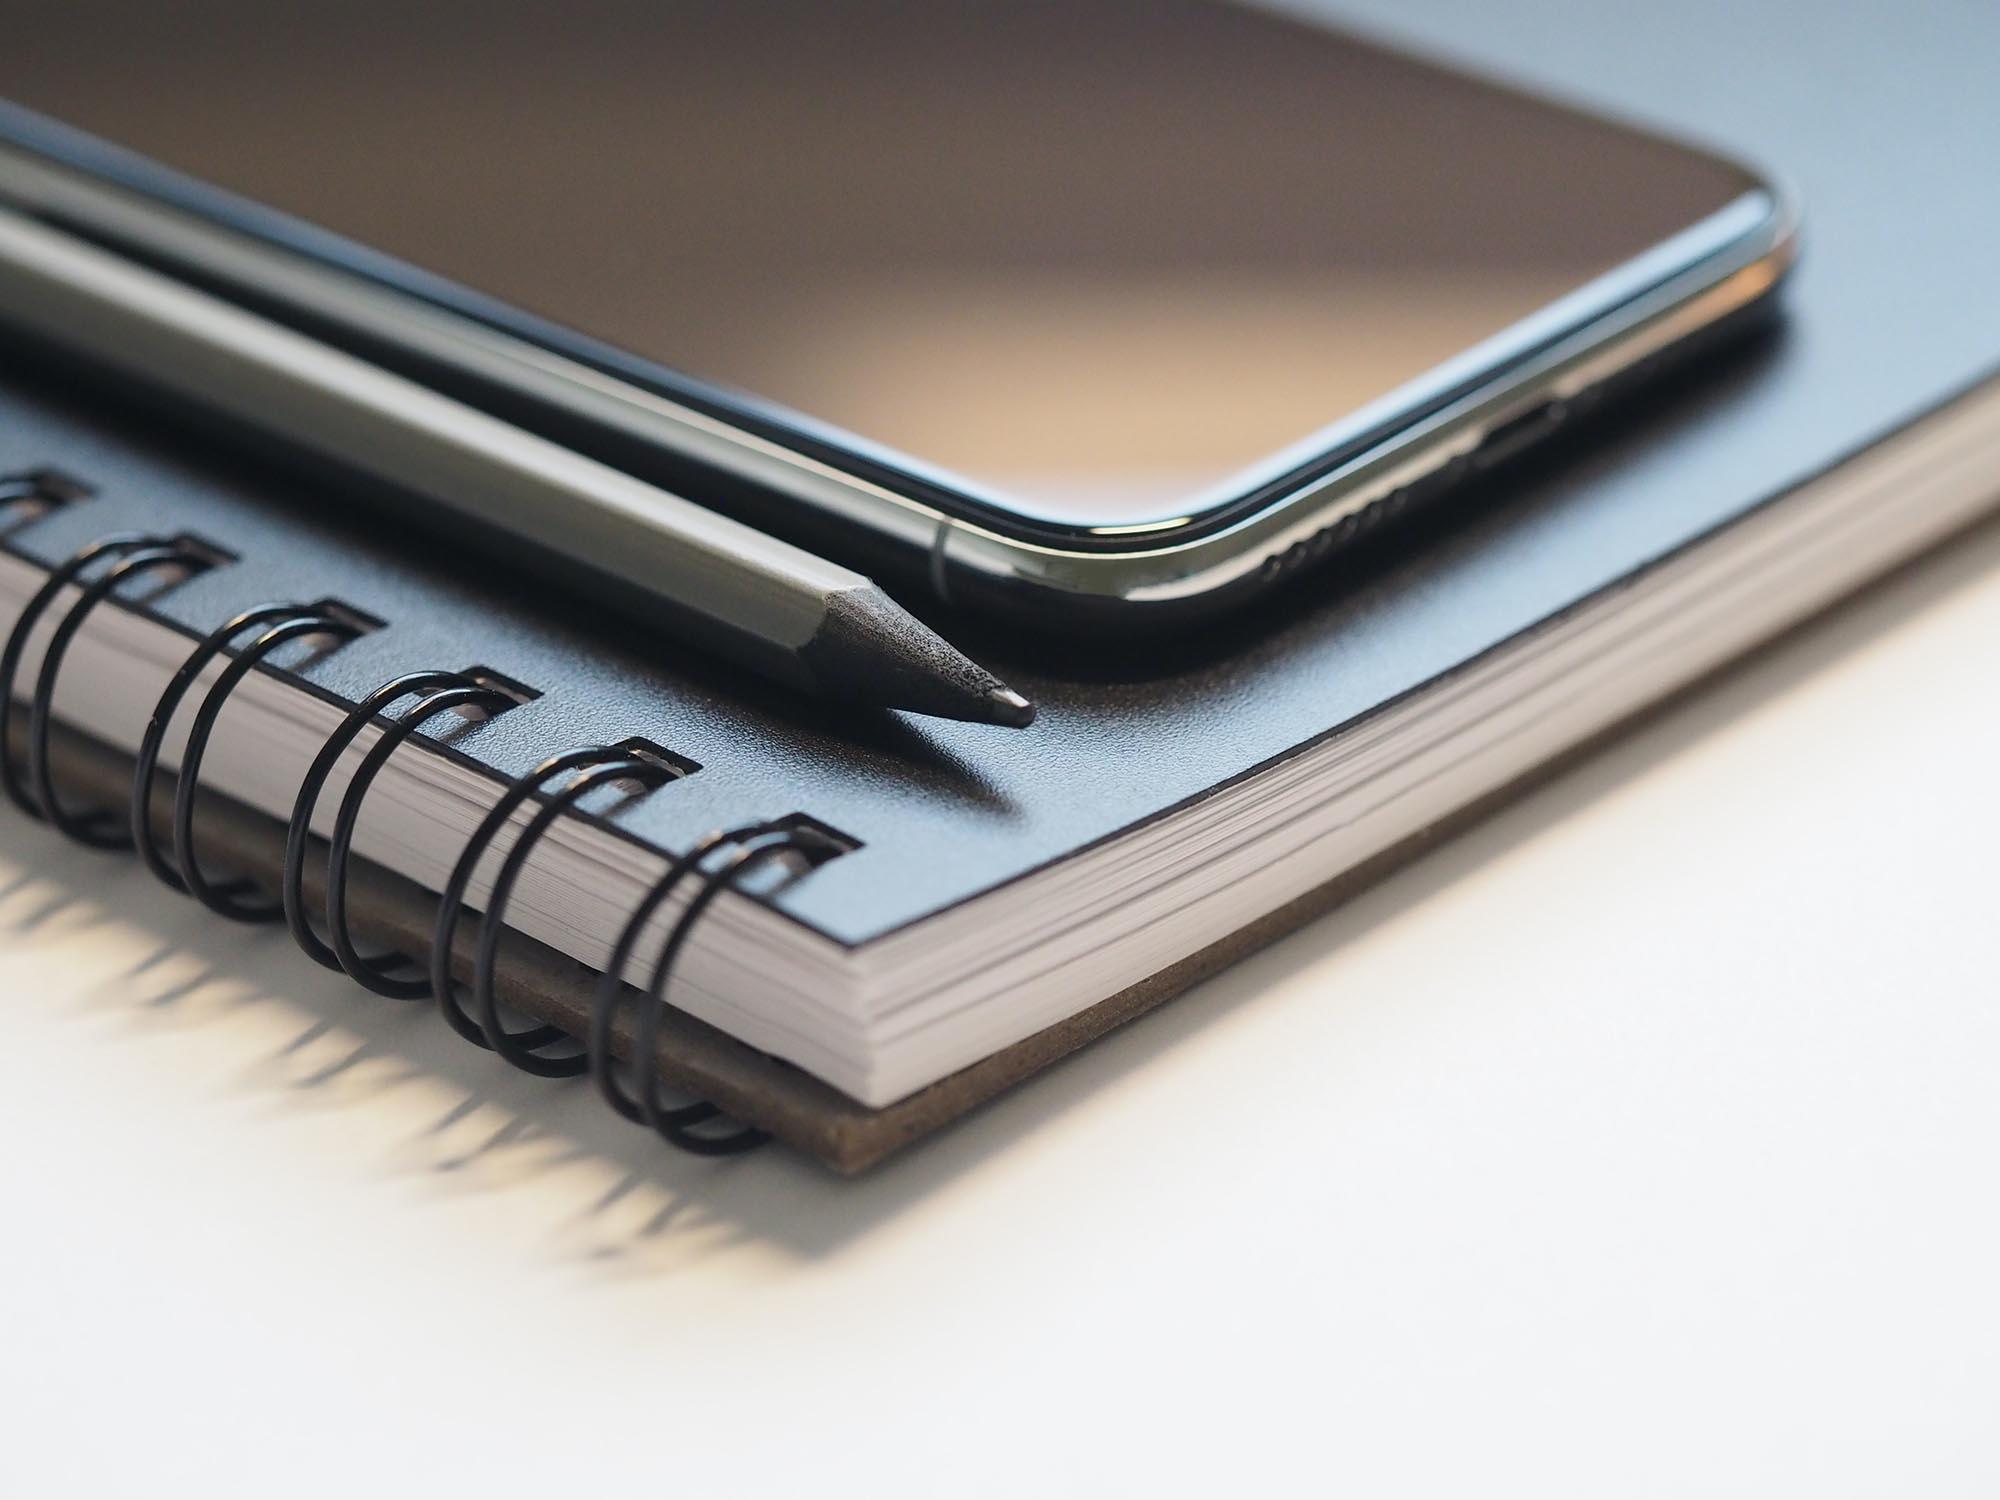 Notizbuch, Handy, Stift,